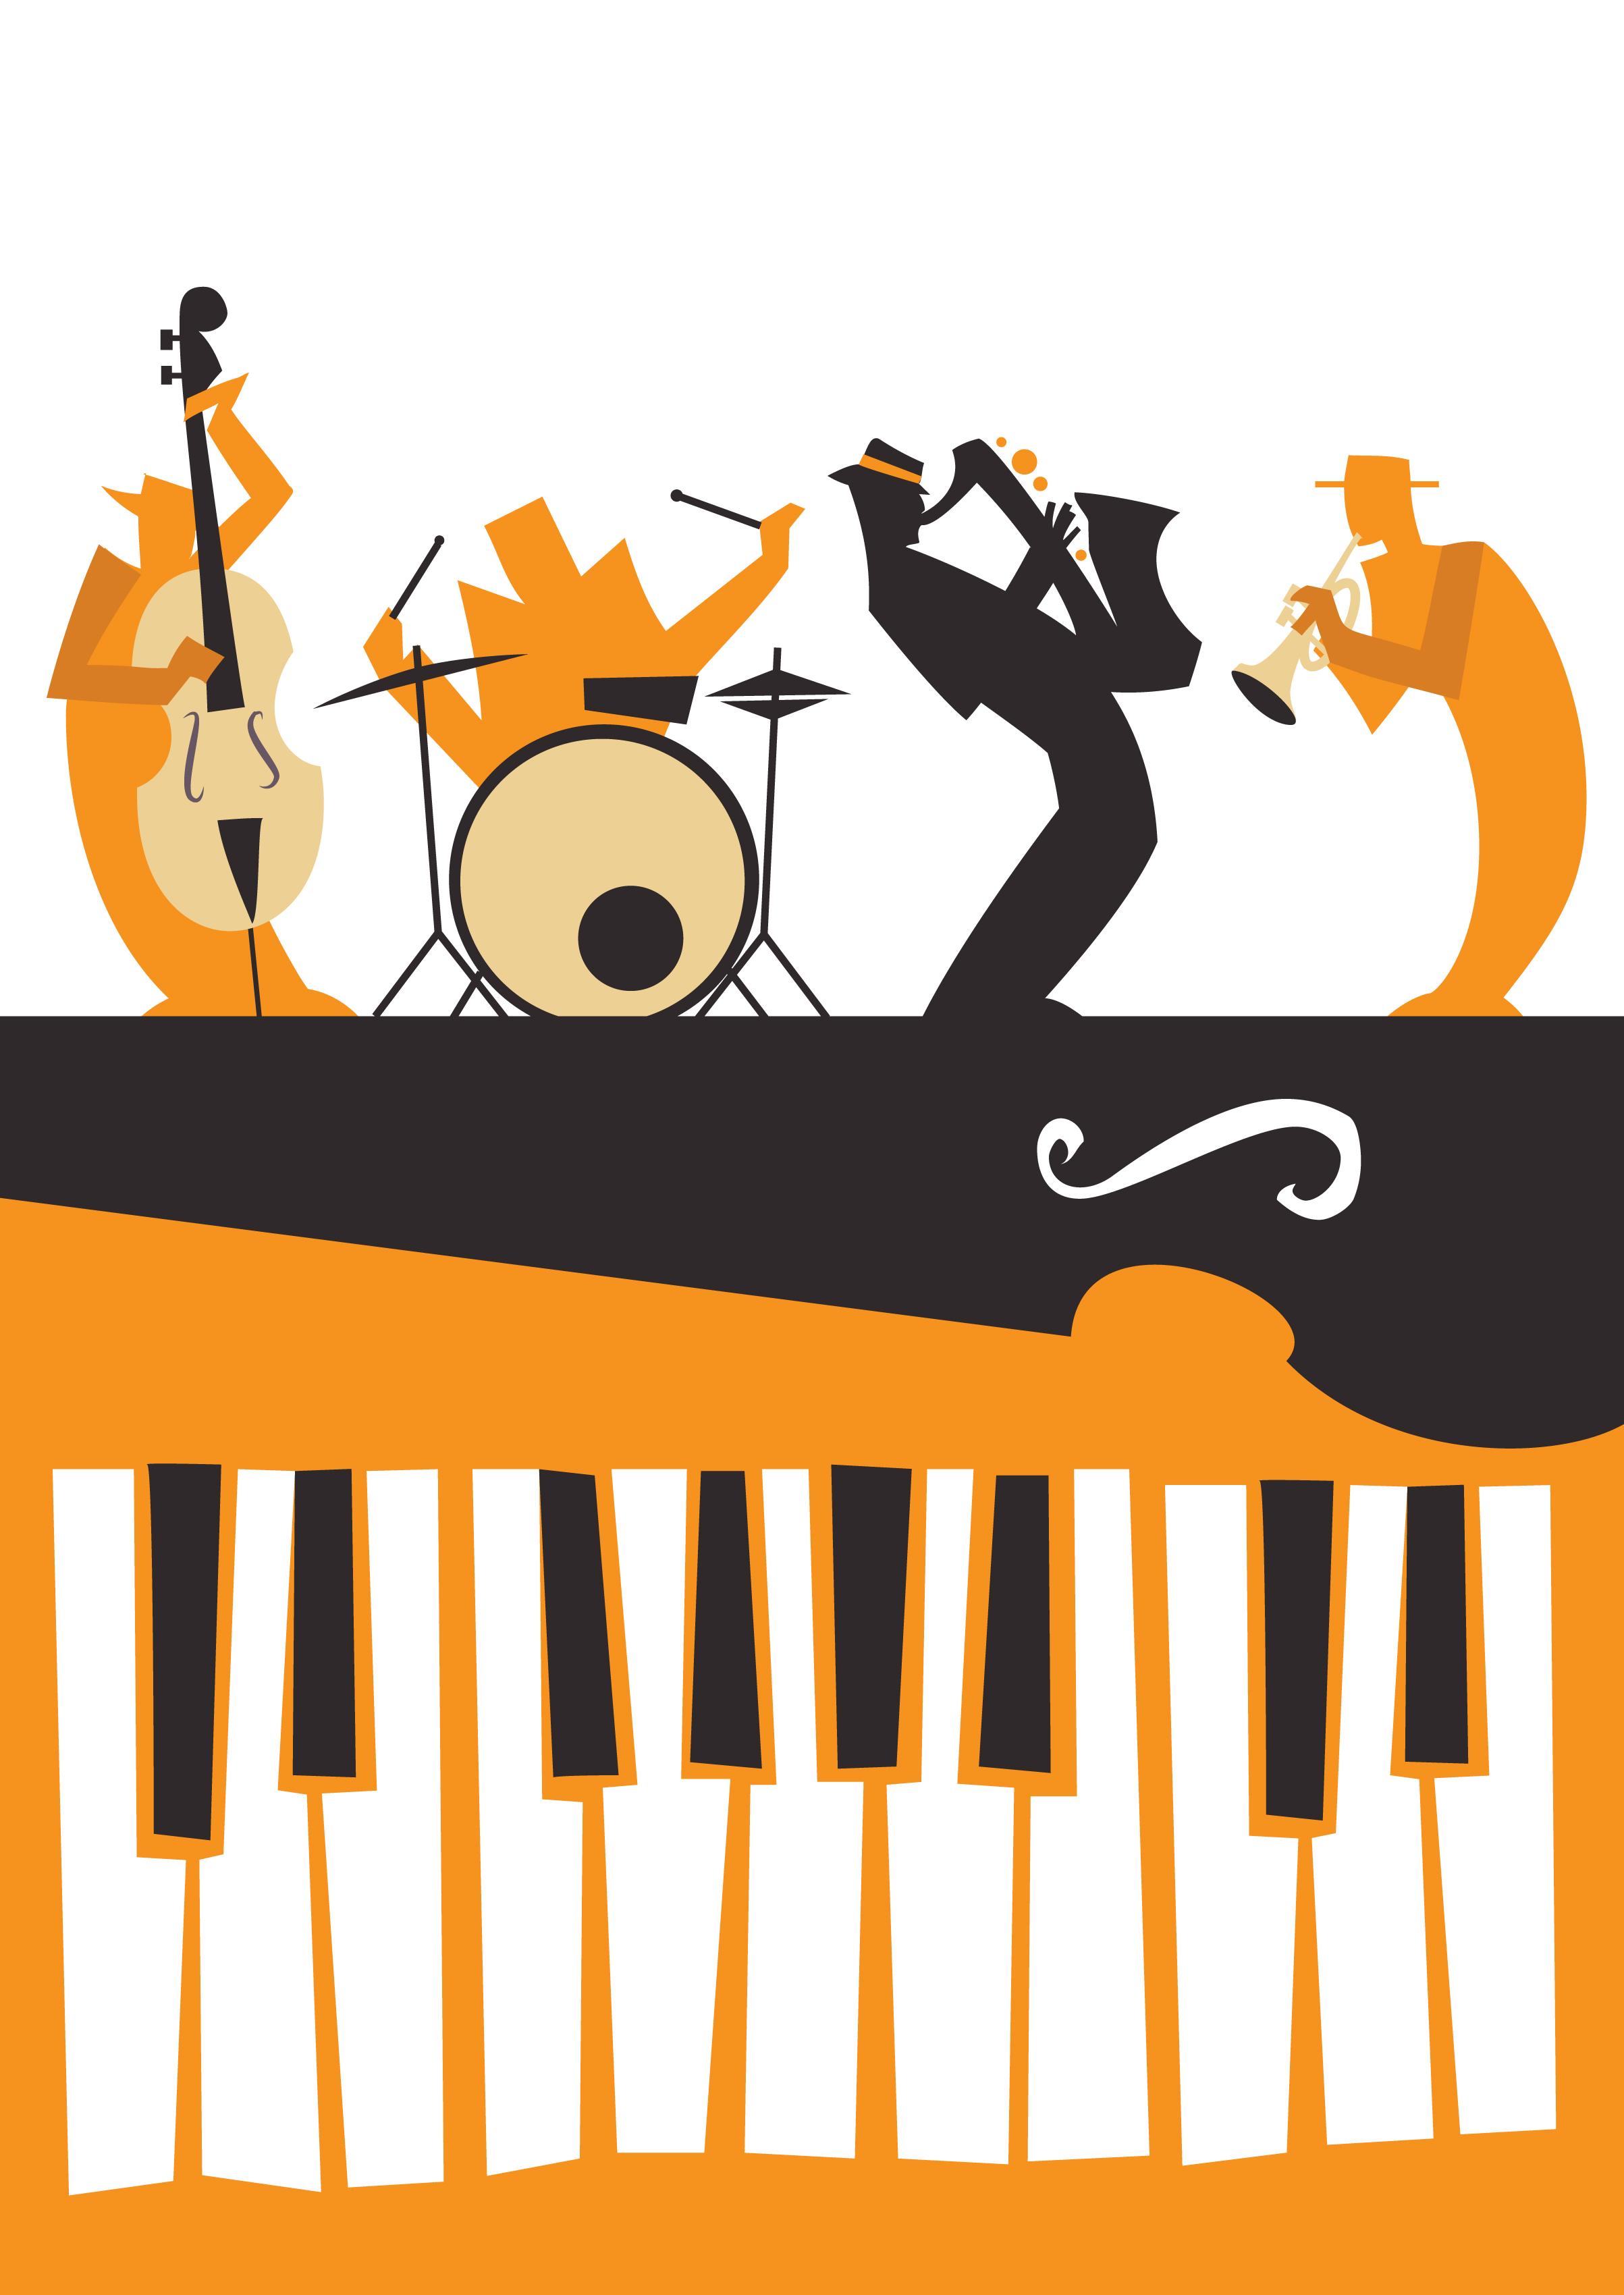 Continuing education improvisation and jazz